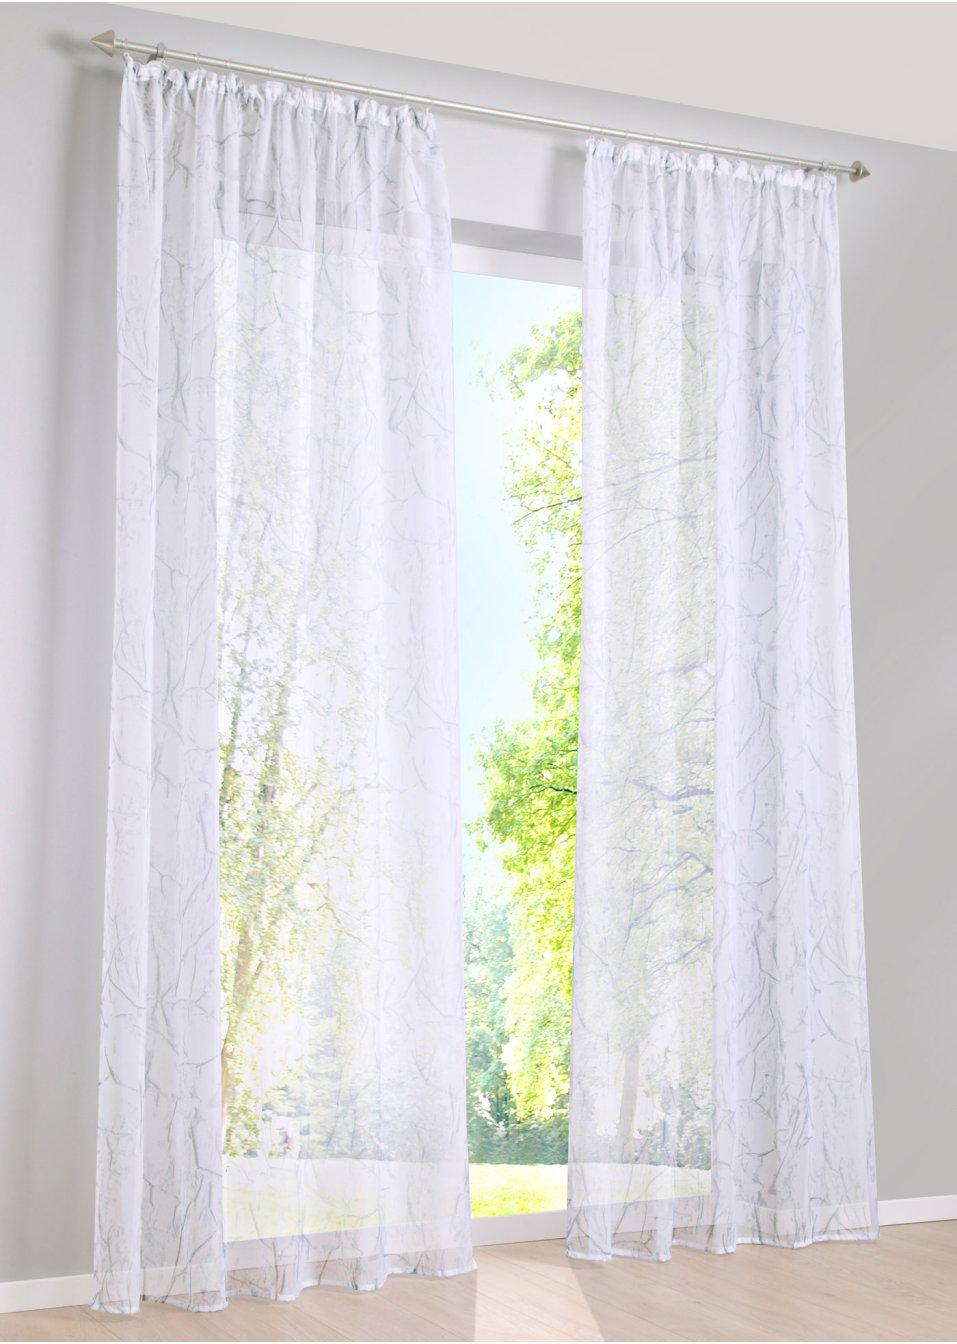 gardine bjarne 1er pack weiss wohnen bpc living. Black Bedroom Furniture Sets. Home Design Ideas